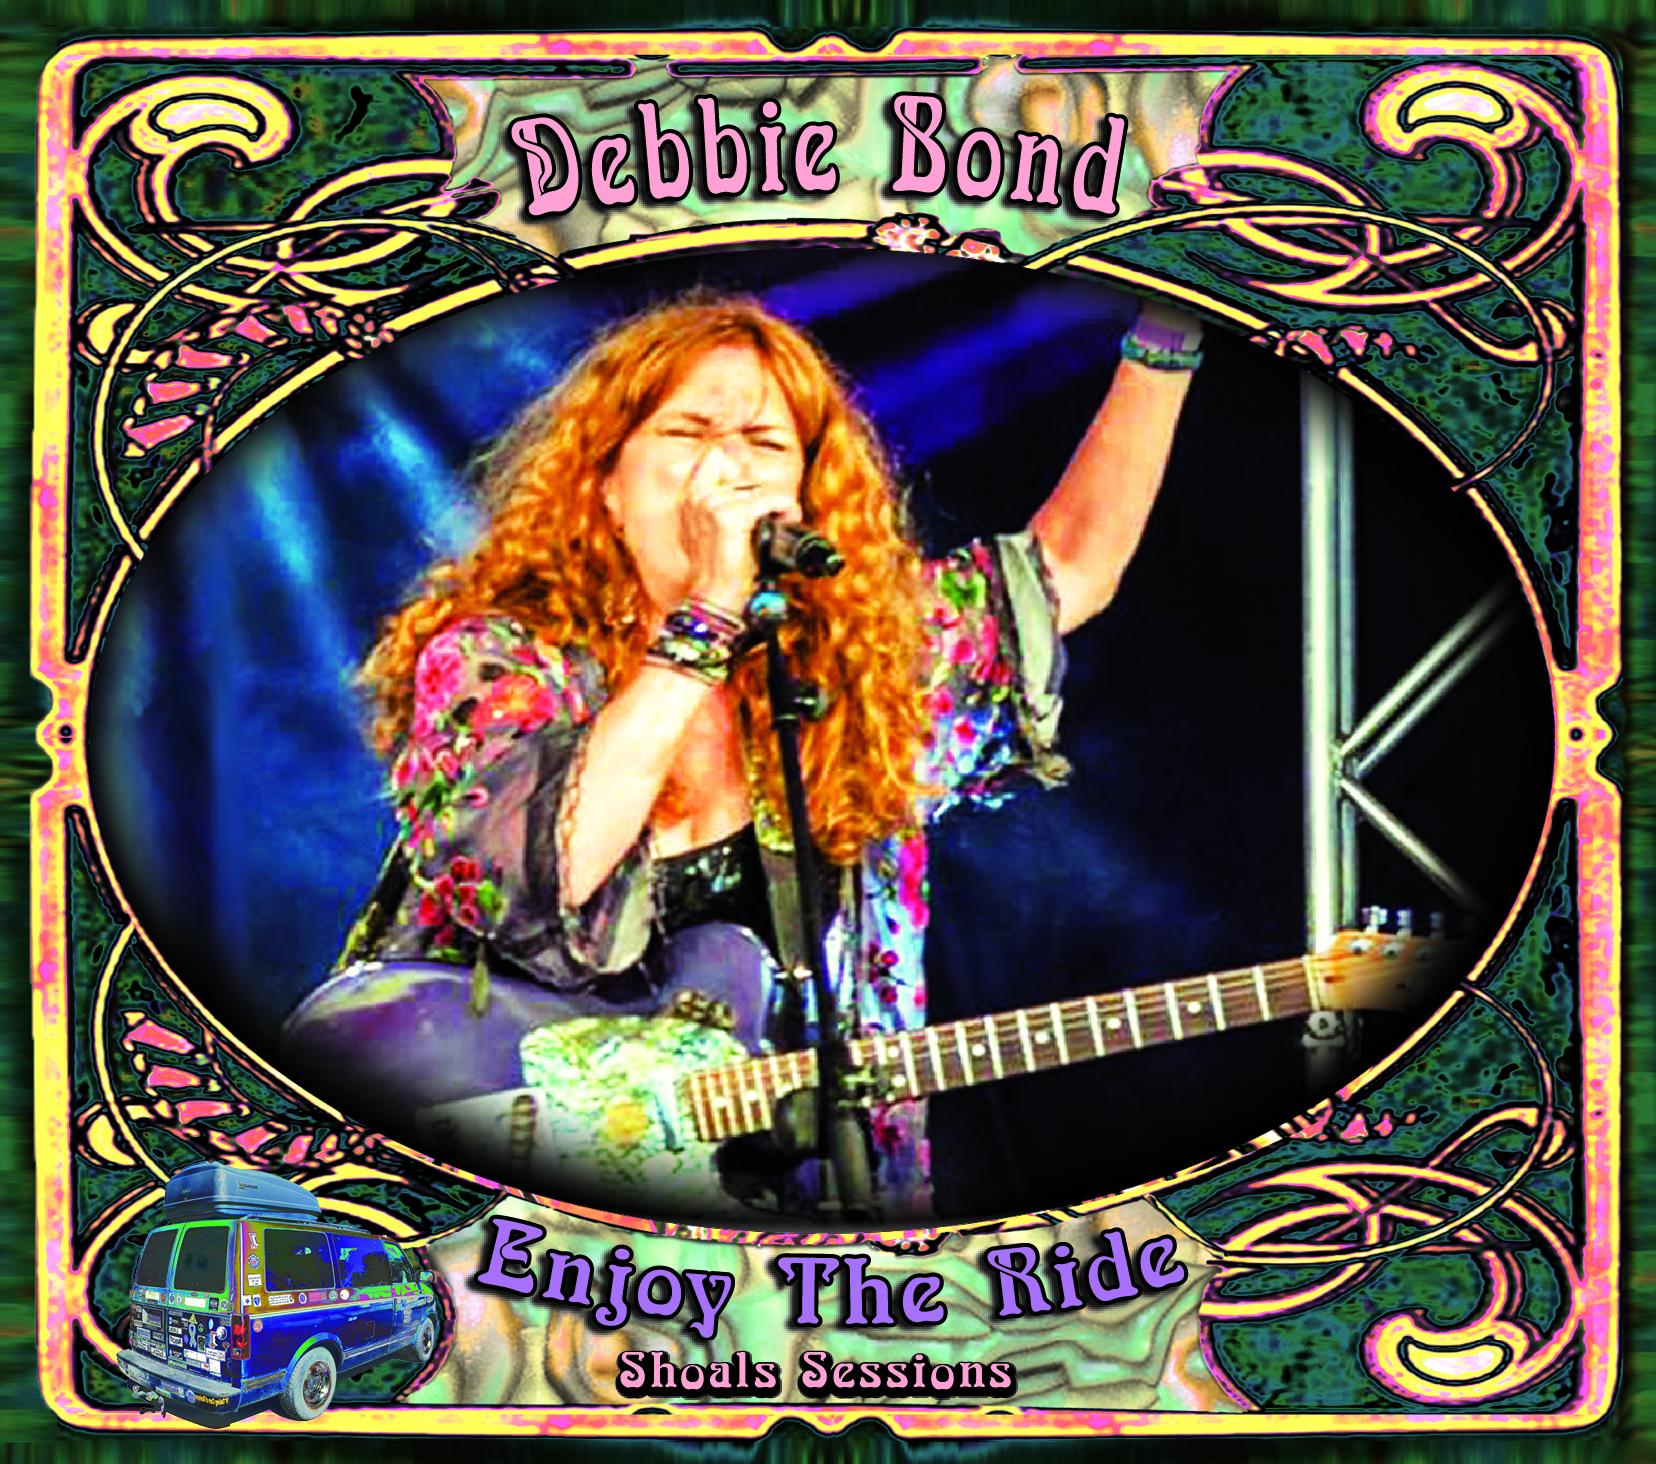 DEBBIE BOND – Enjoy theride